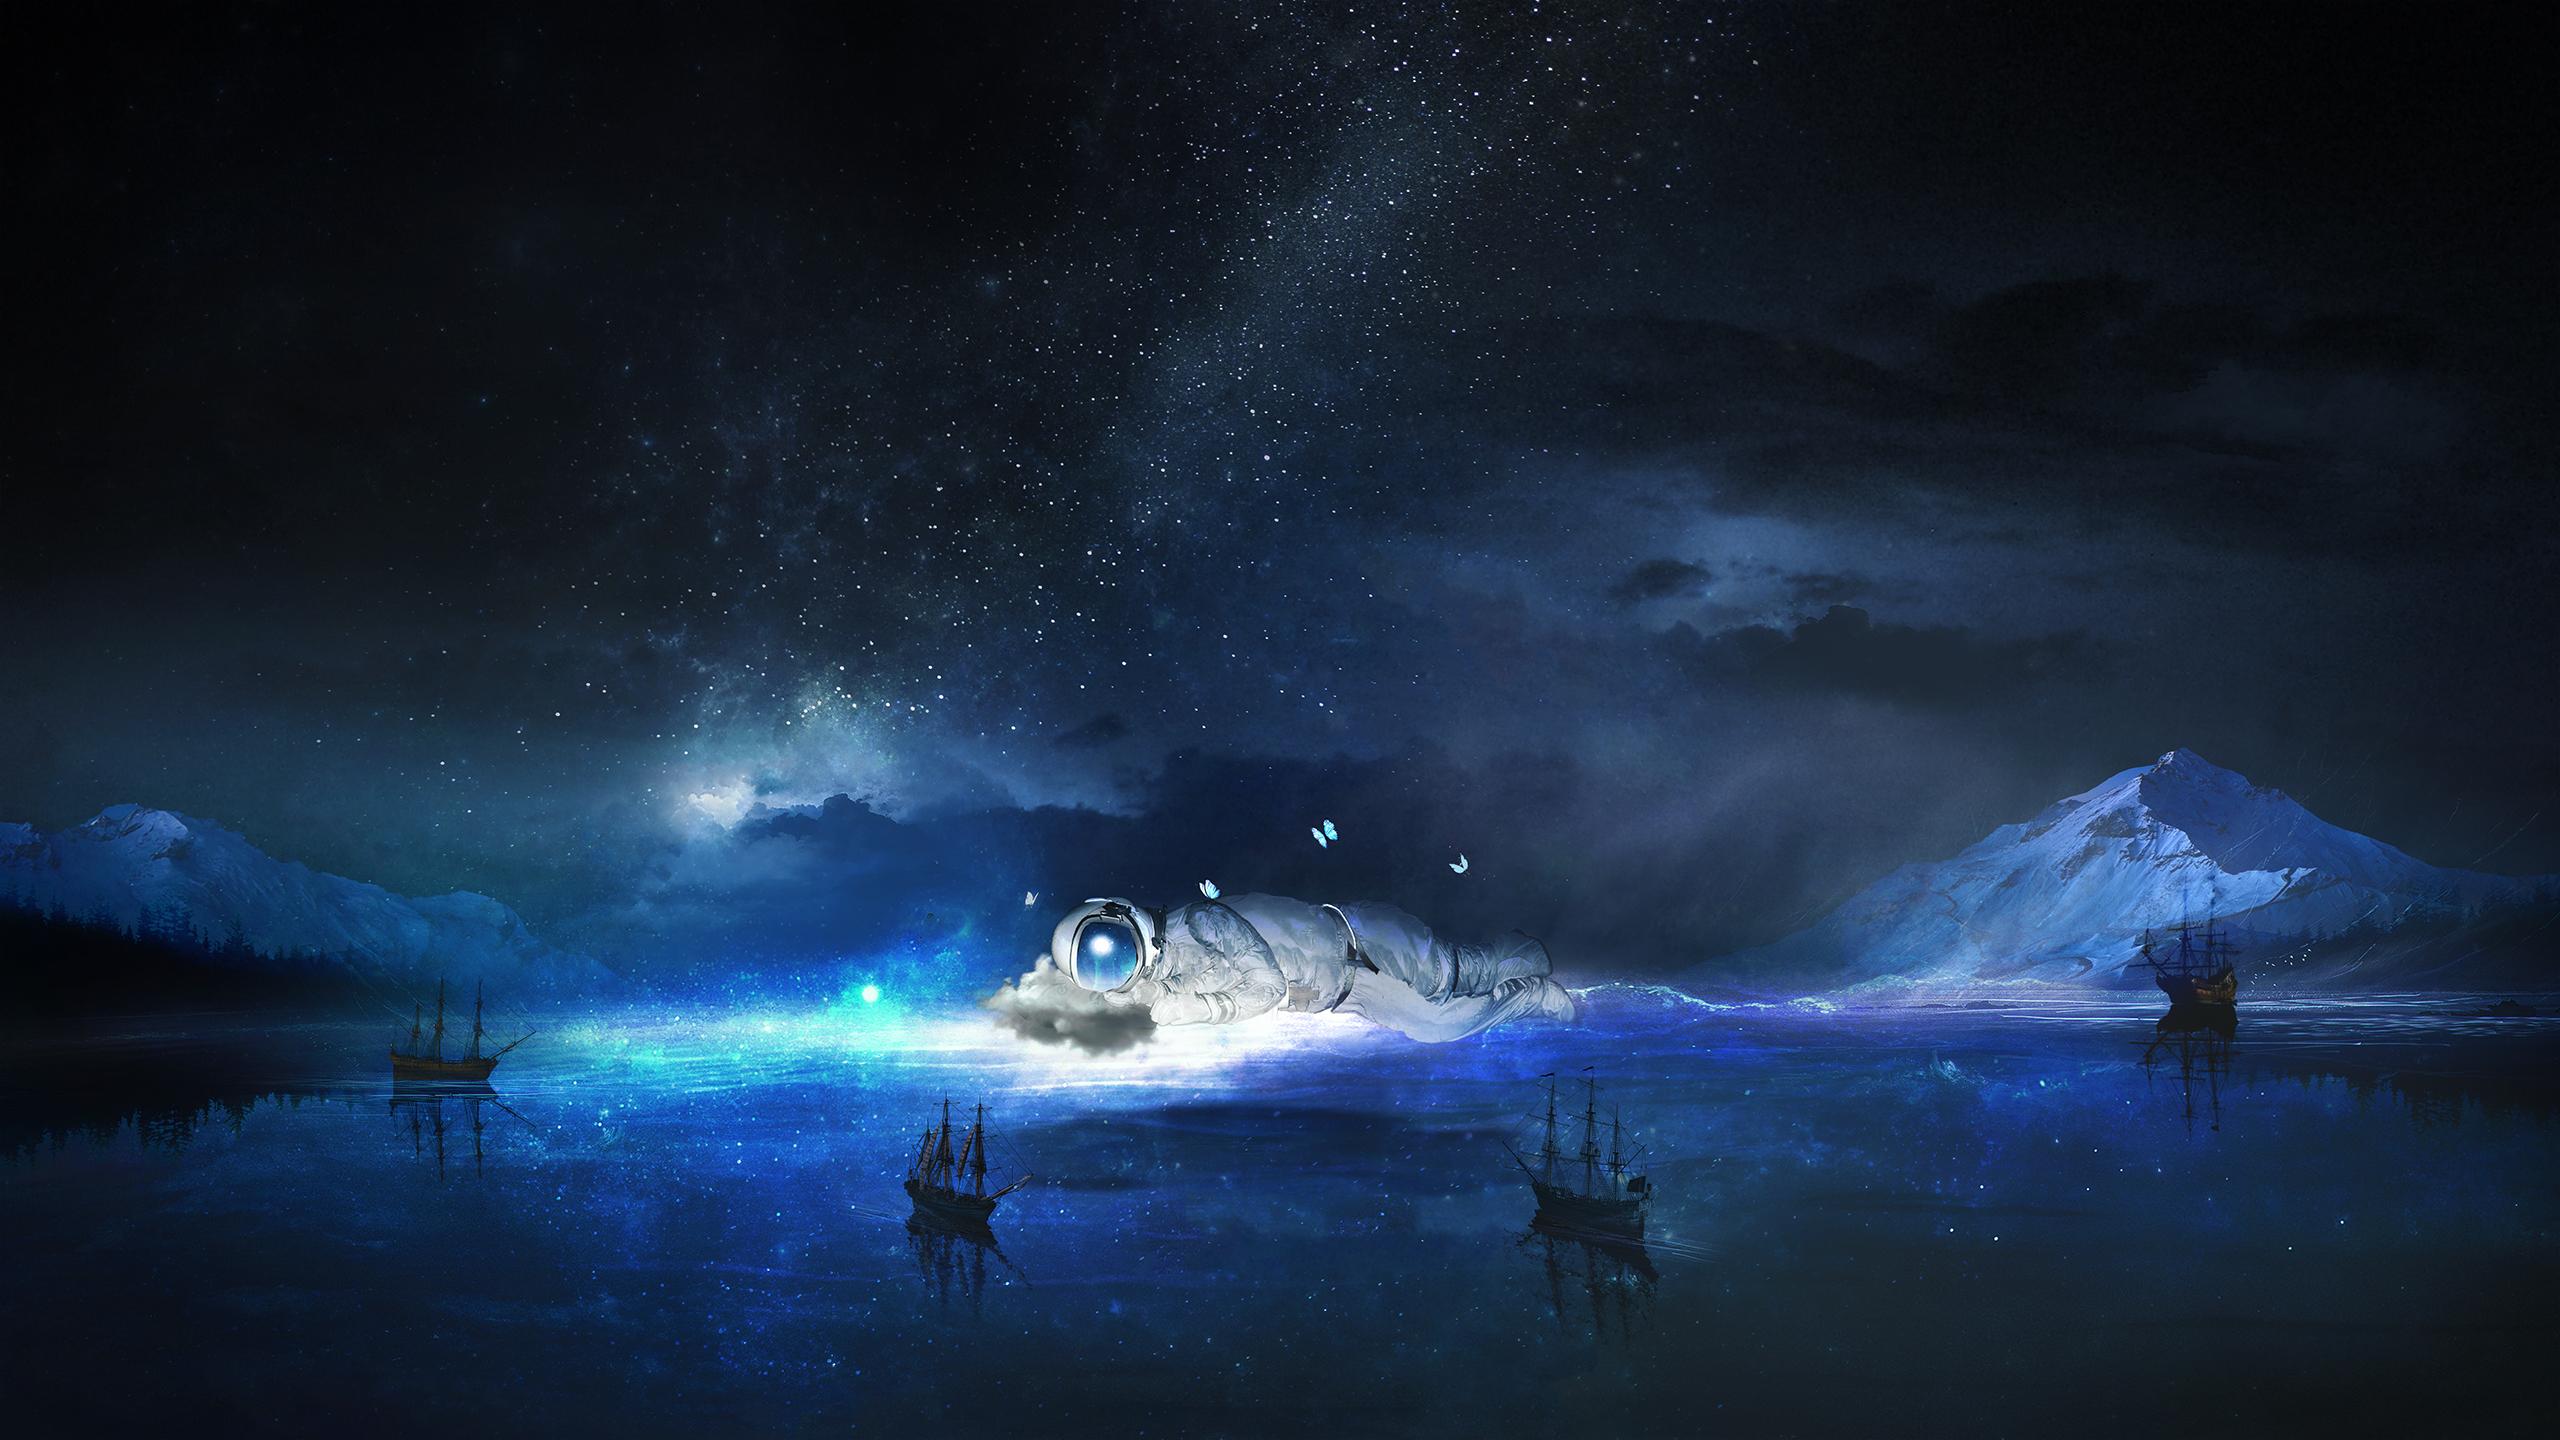 Stellar by t1na